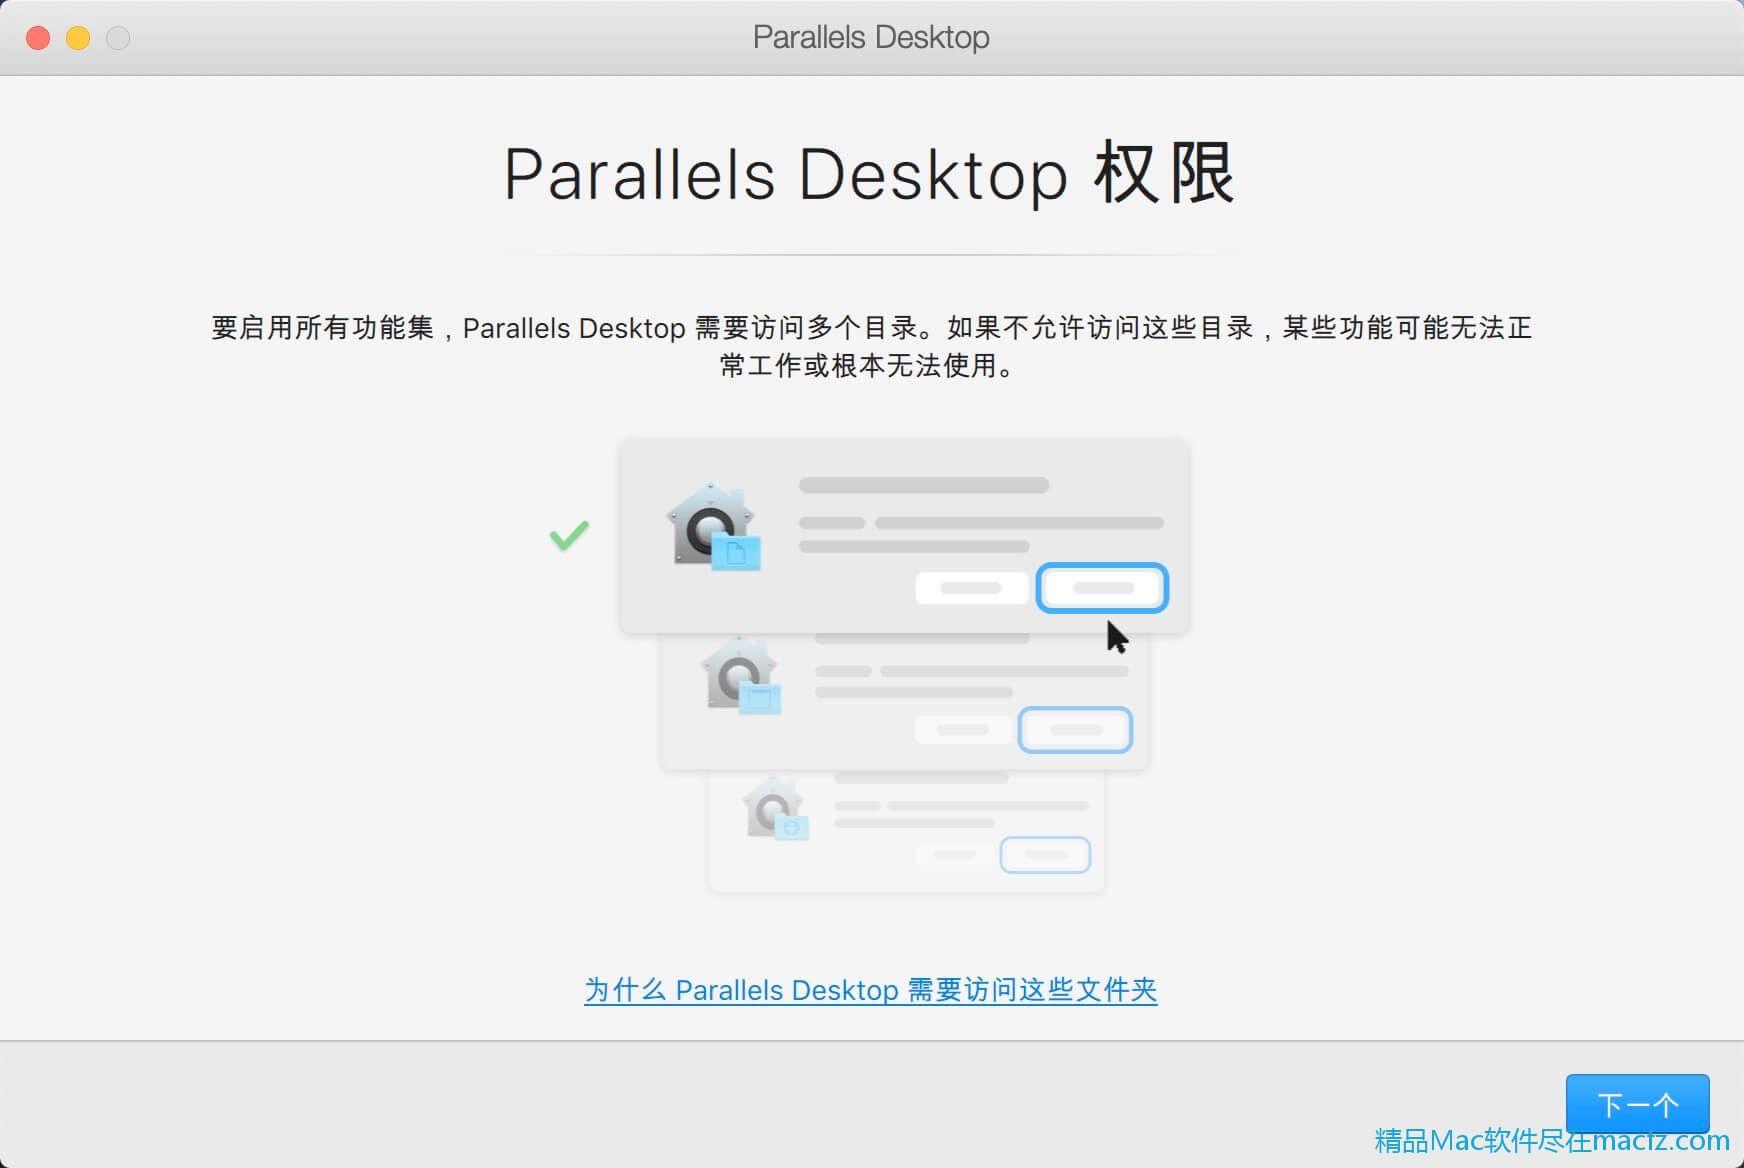 Parallels Desktop 16 无法联网 解决方法